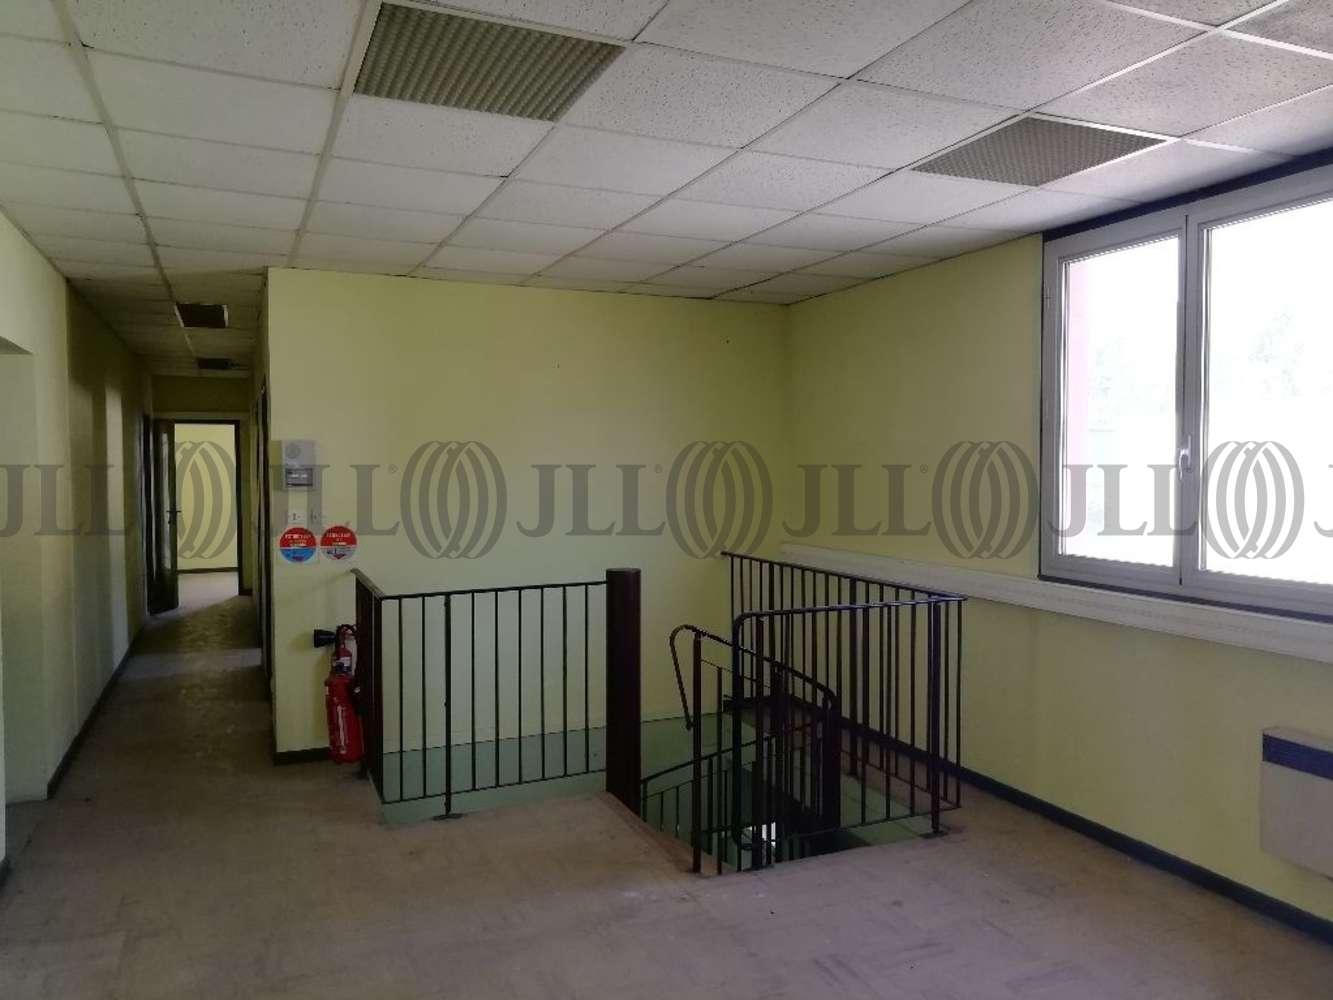 Activités/entrepôt Givors, 69700 - Location entrepot - Proche Lyon (69) - 10815332